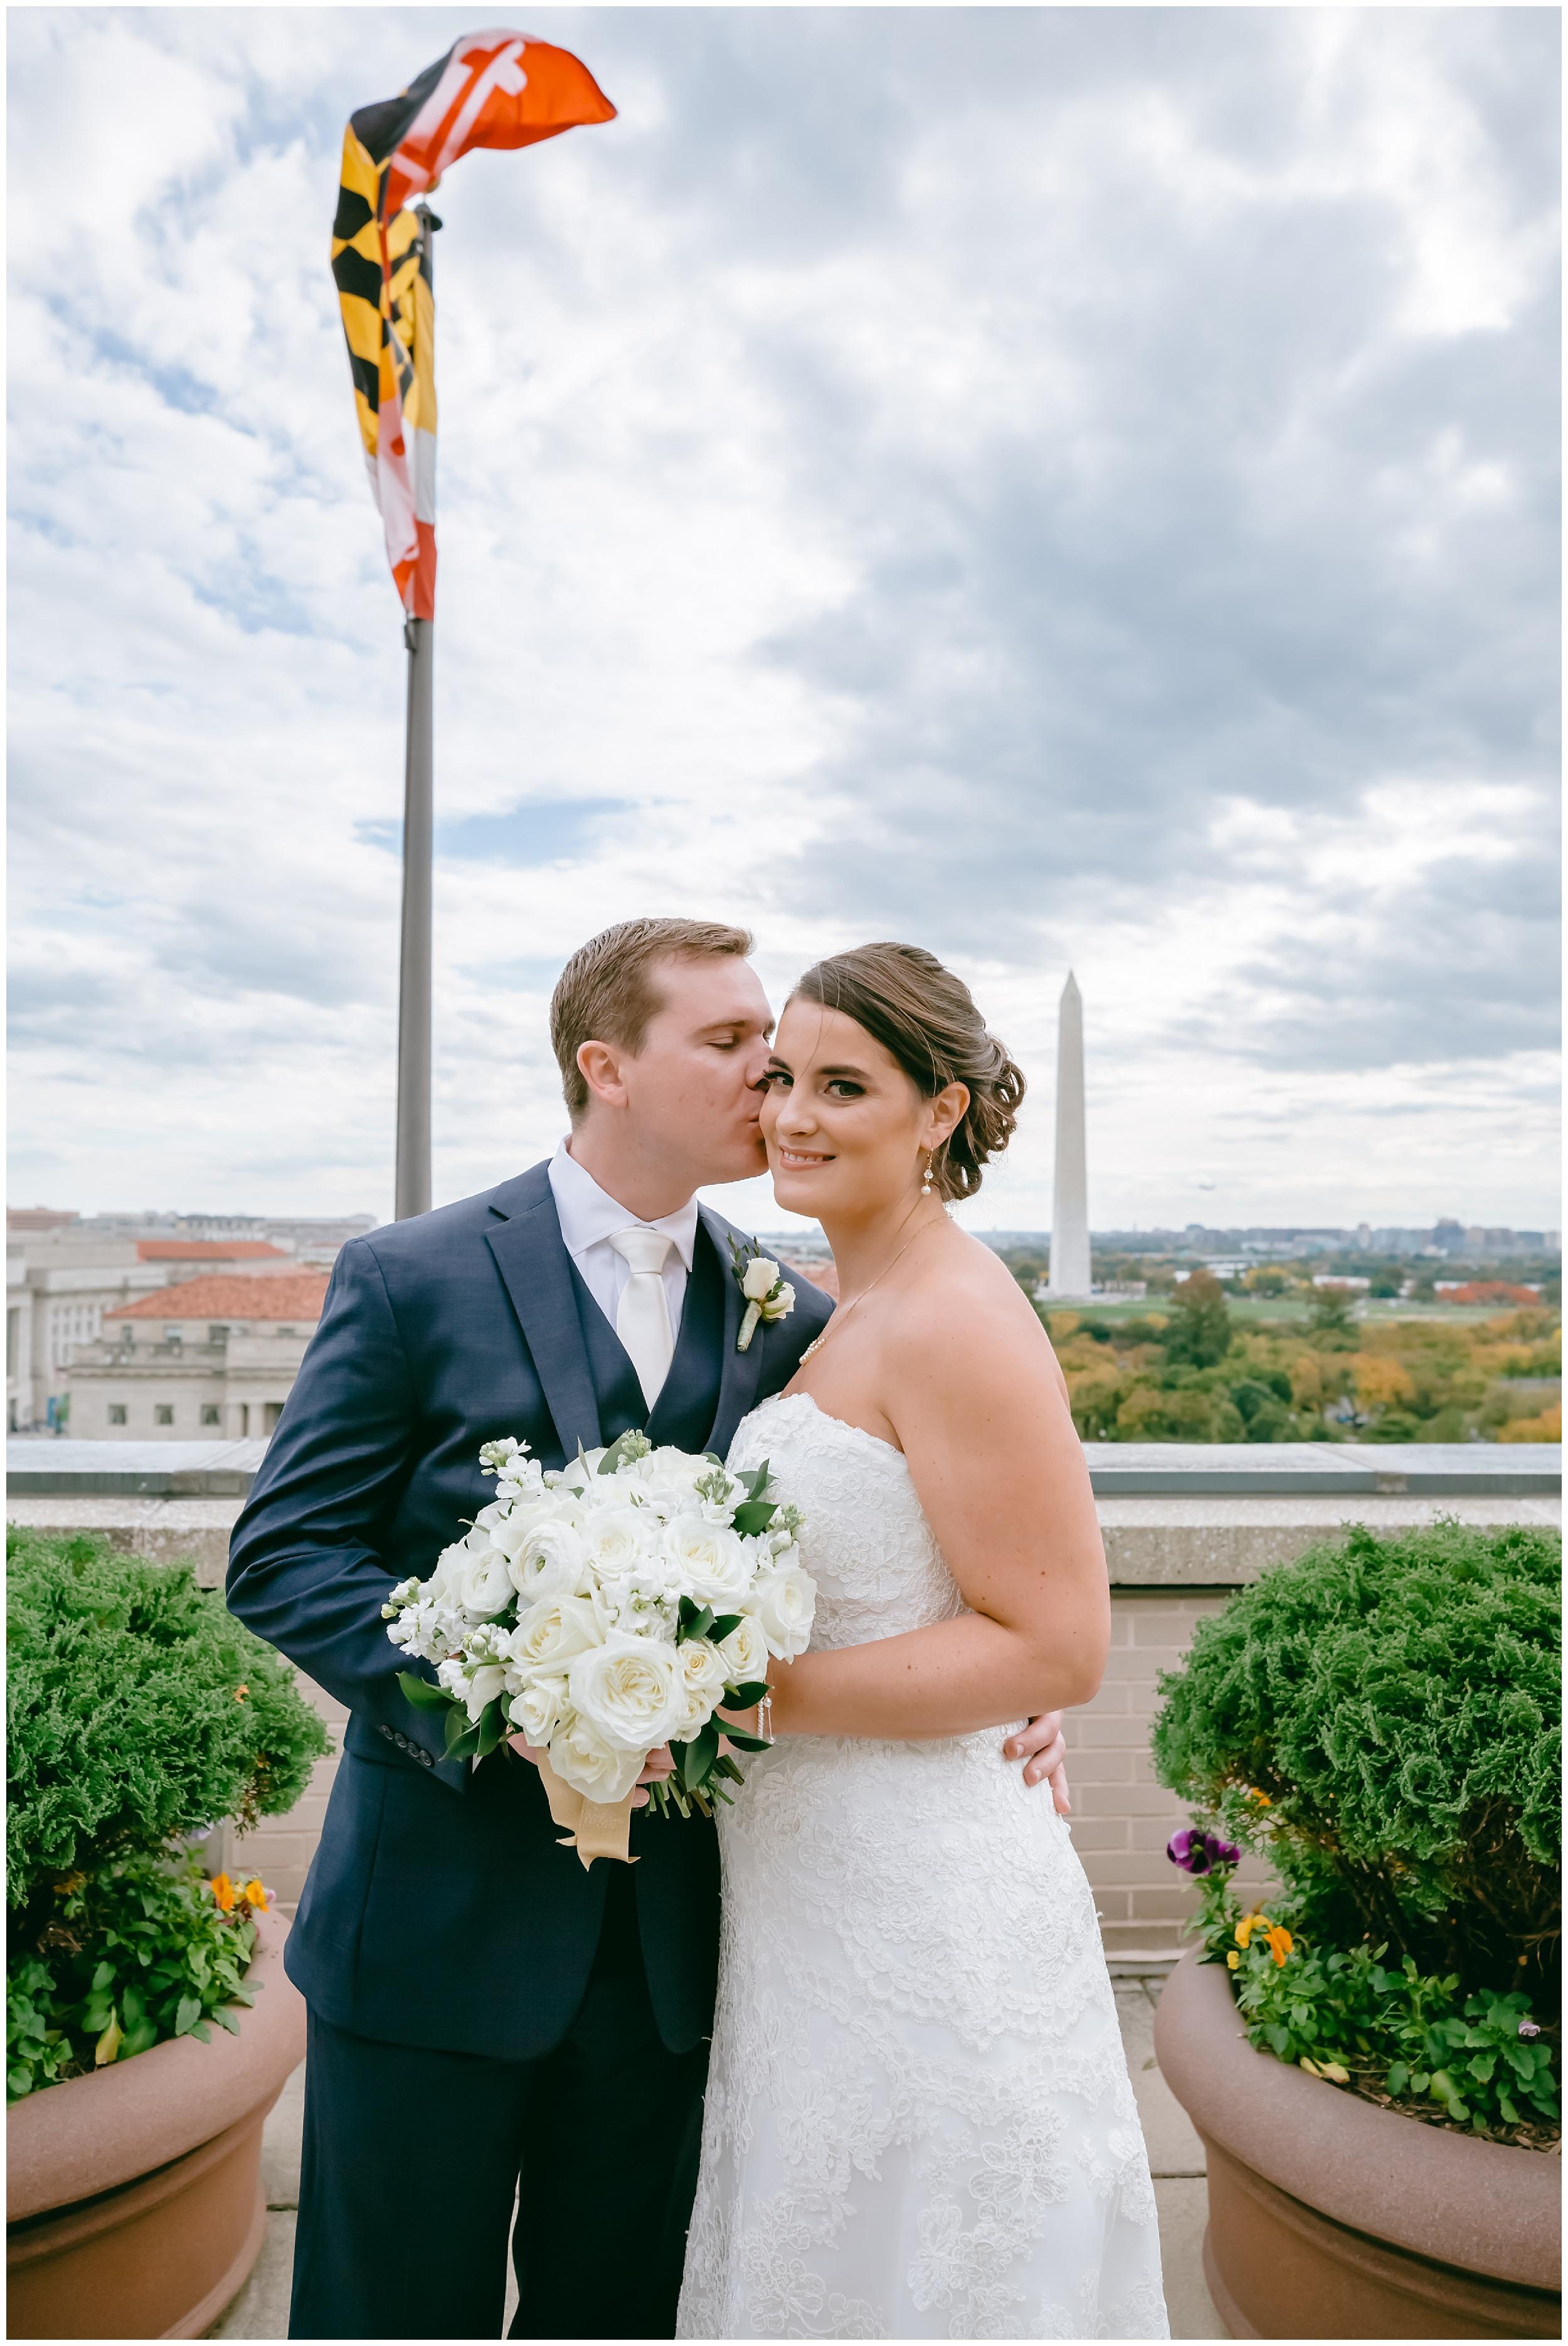 wedding-bride-groom-portrait-rooftop-willard-hotel-first-look-washington-dc-photographer